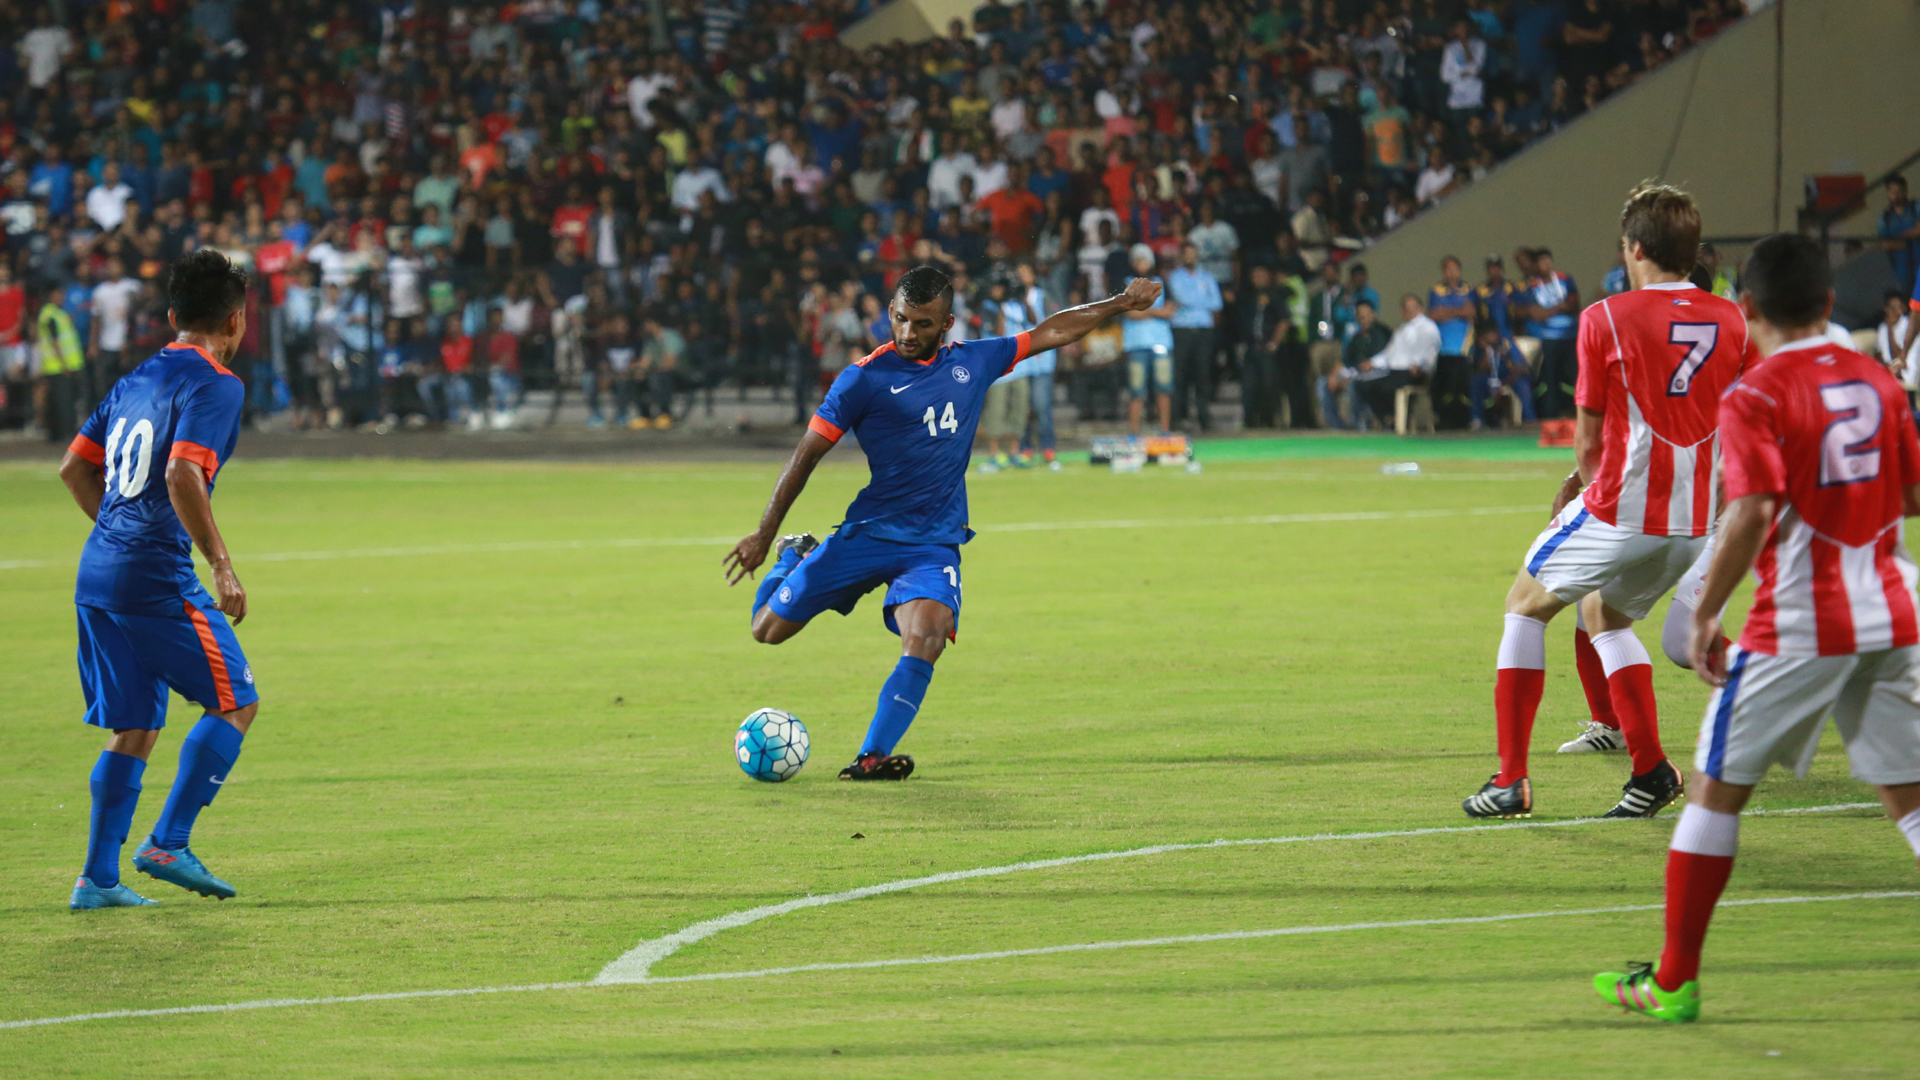 Pronay Halder India Puerto Rico International Friendly